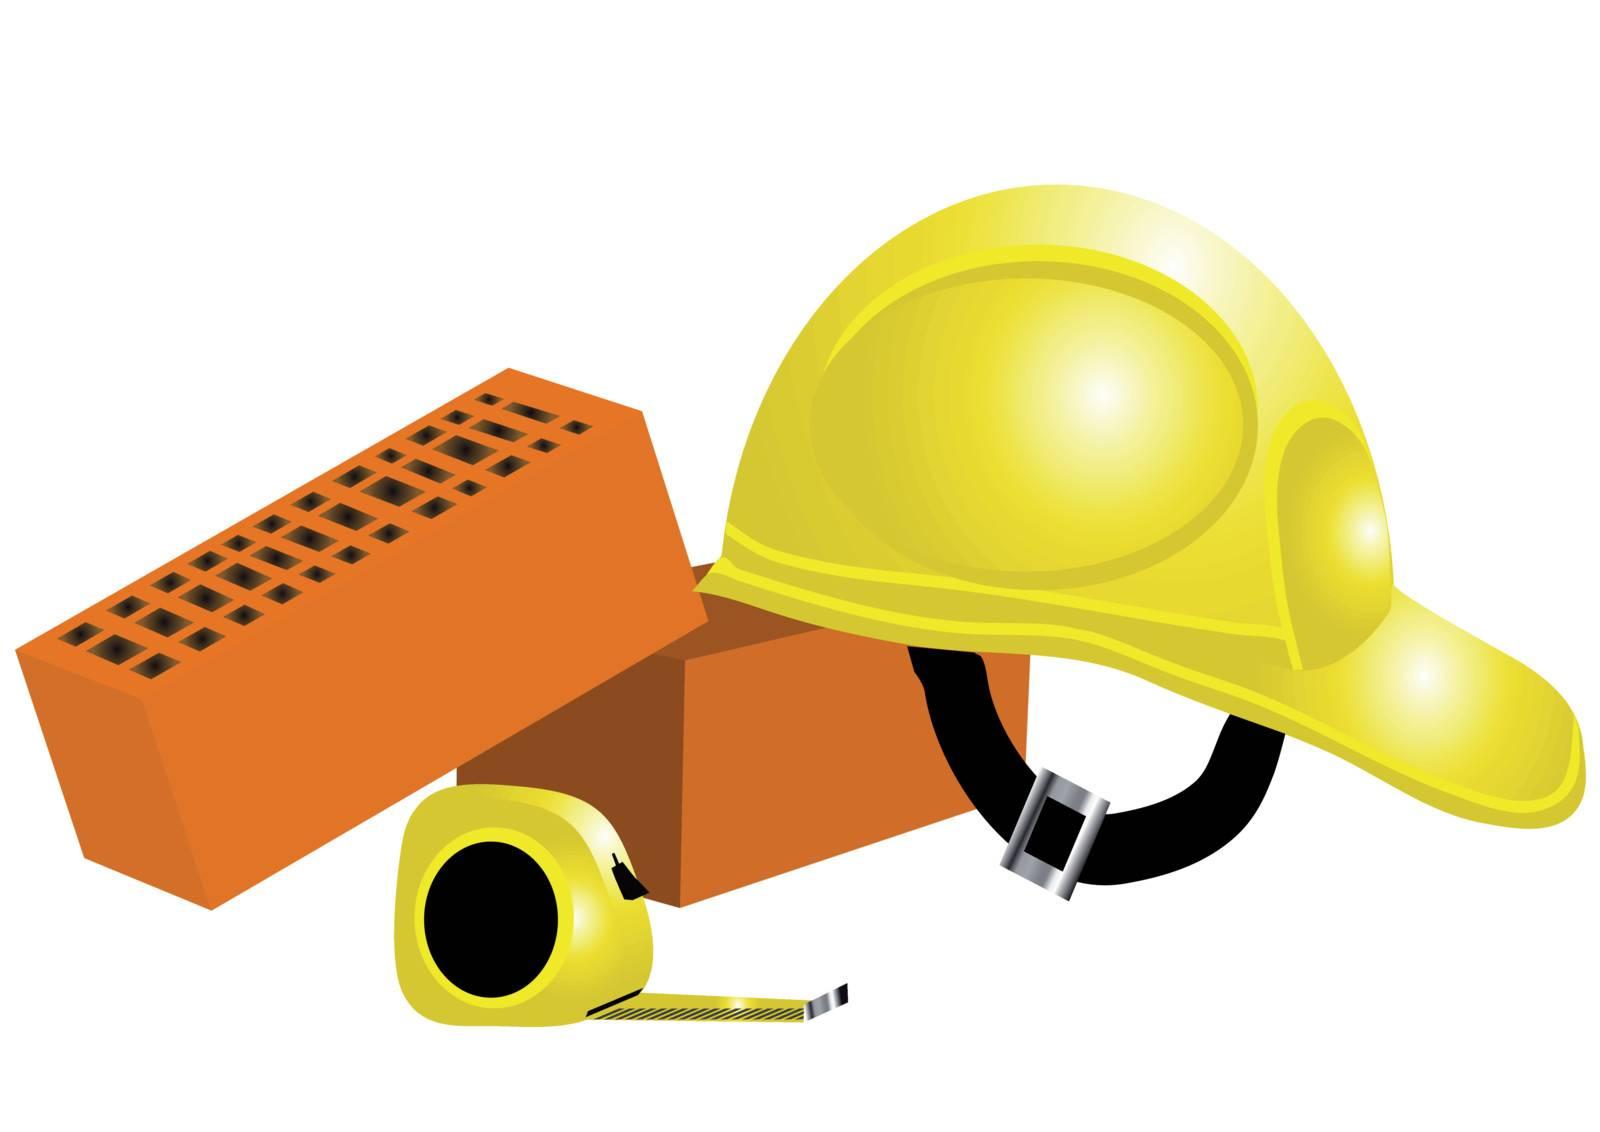 tape-measure, helmet, bricks  by arkela